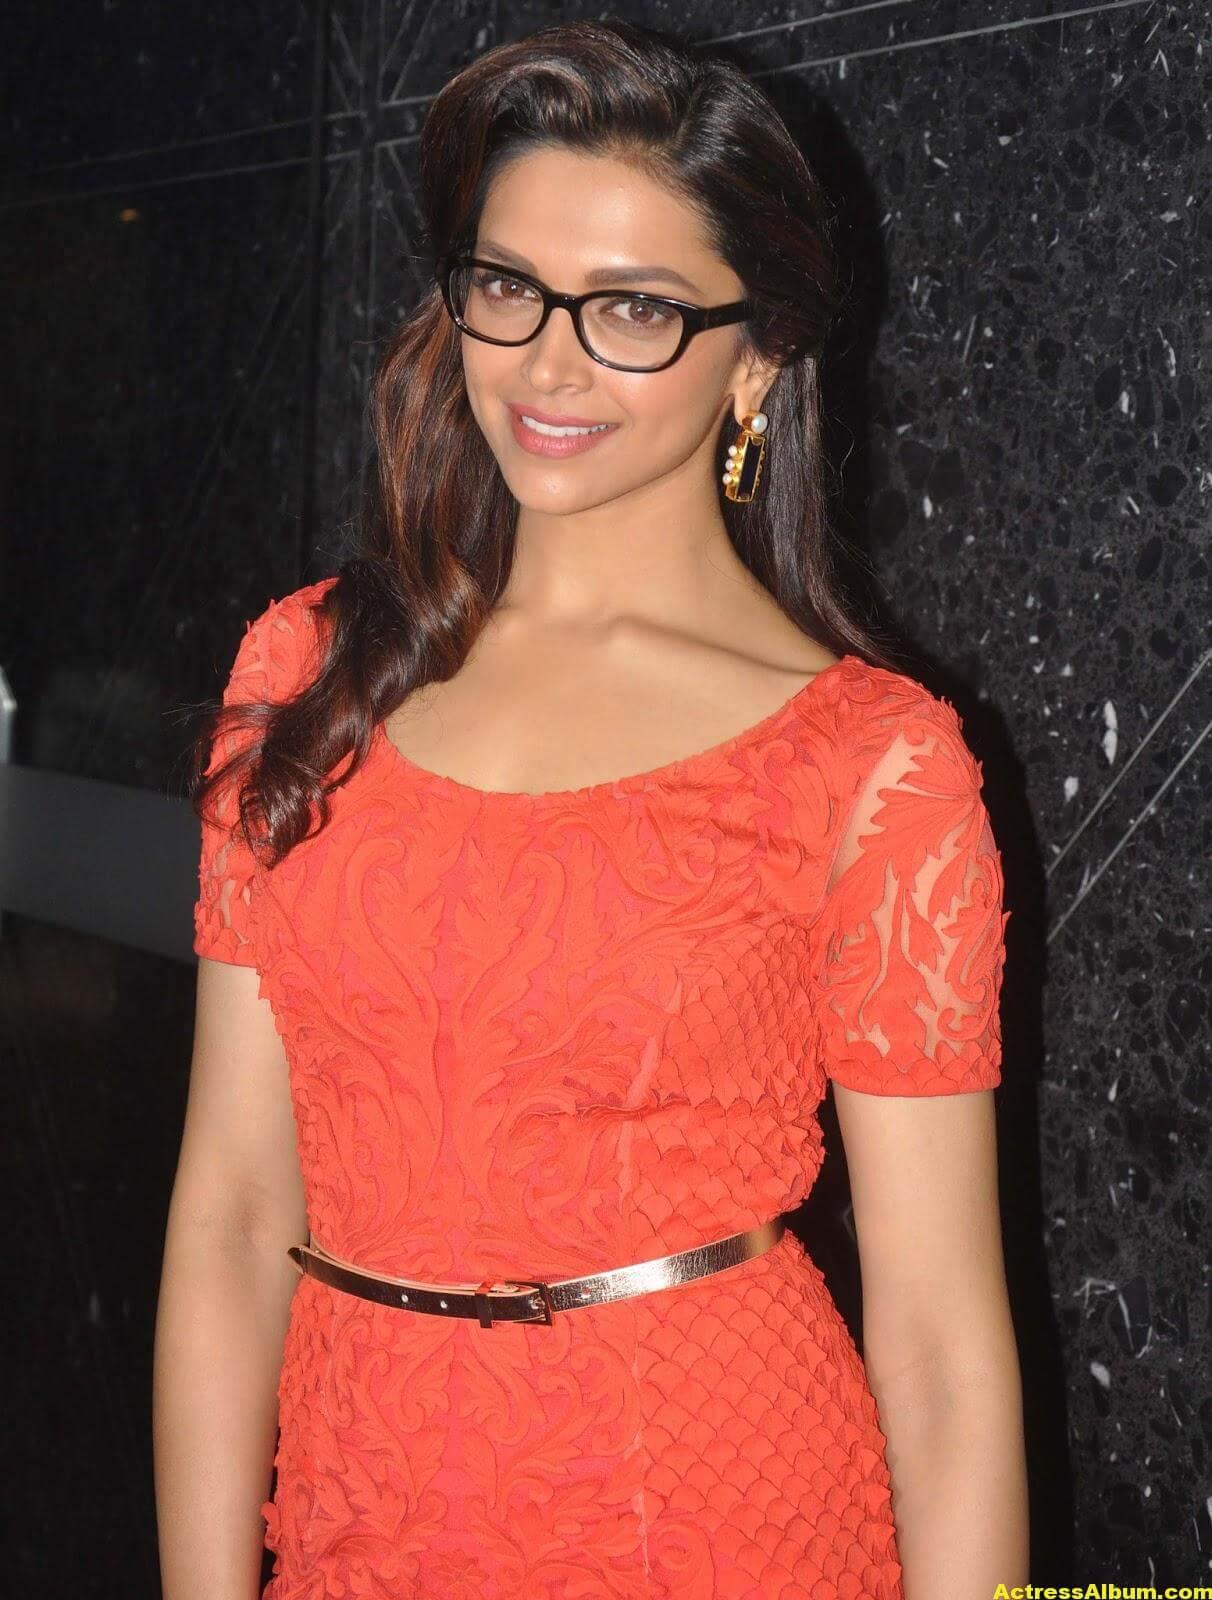 Deepika Padukone Photos In Orange Dress With Glass 1